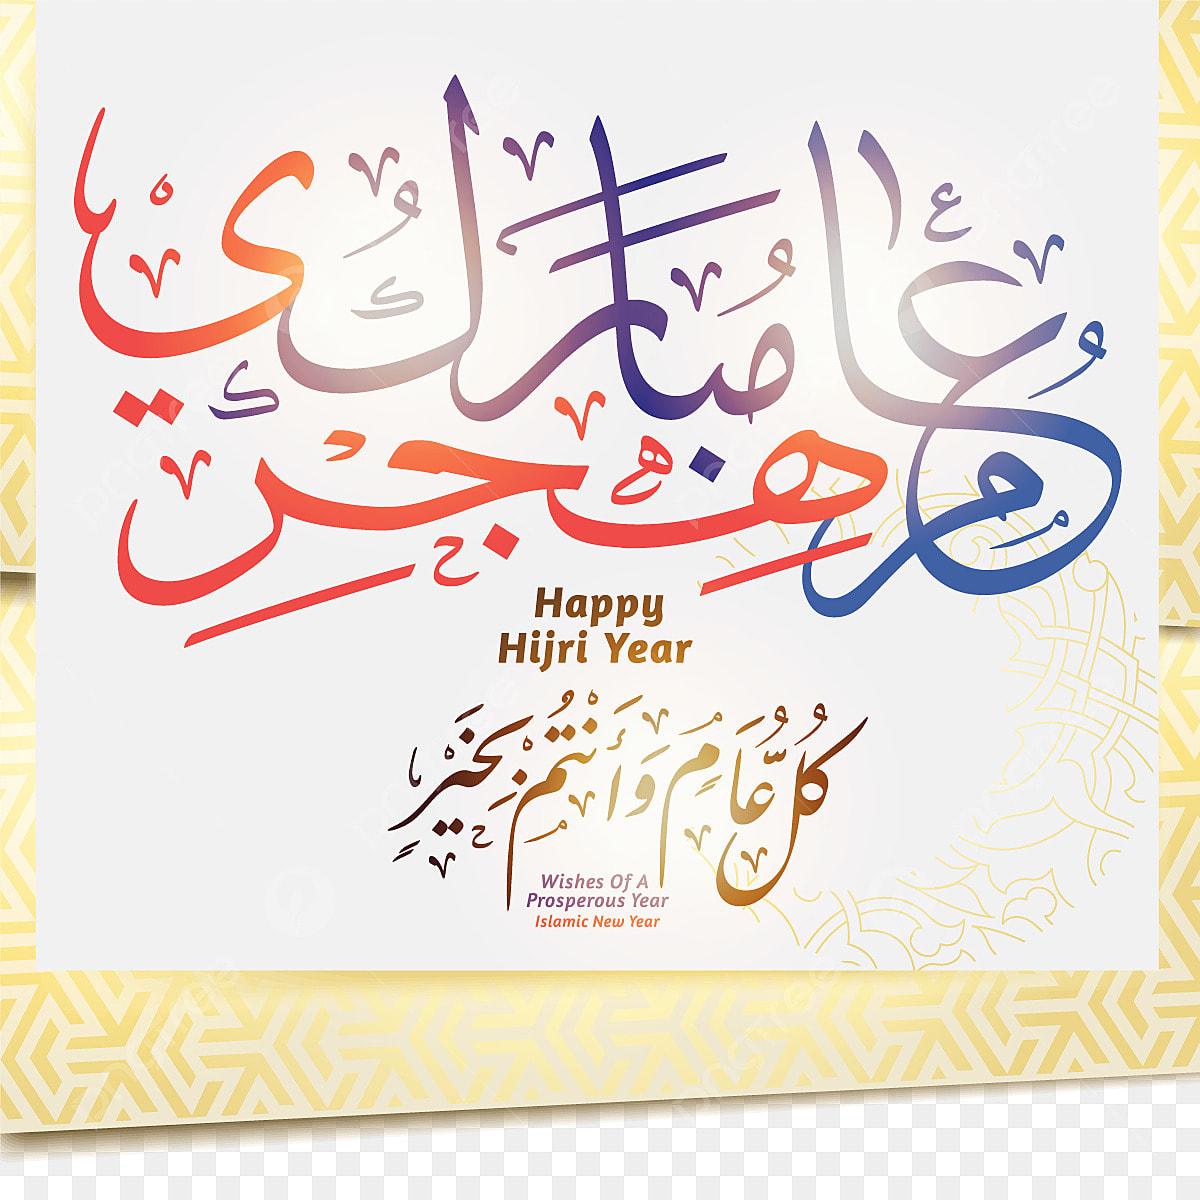 Happy Hijri Year Arabic Calligraphy Elements On Arabic Ornament